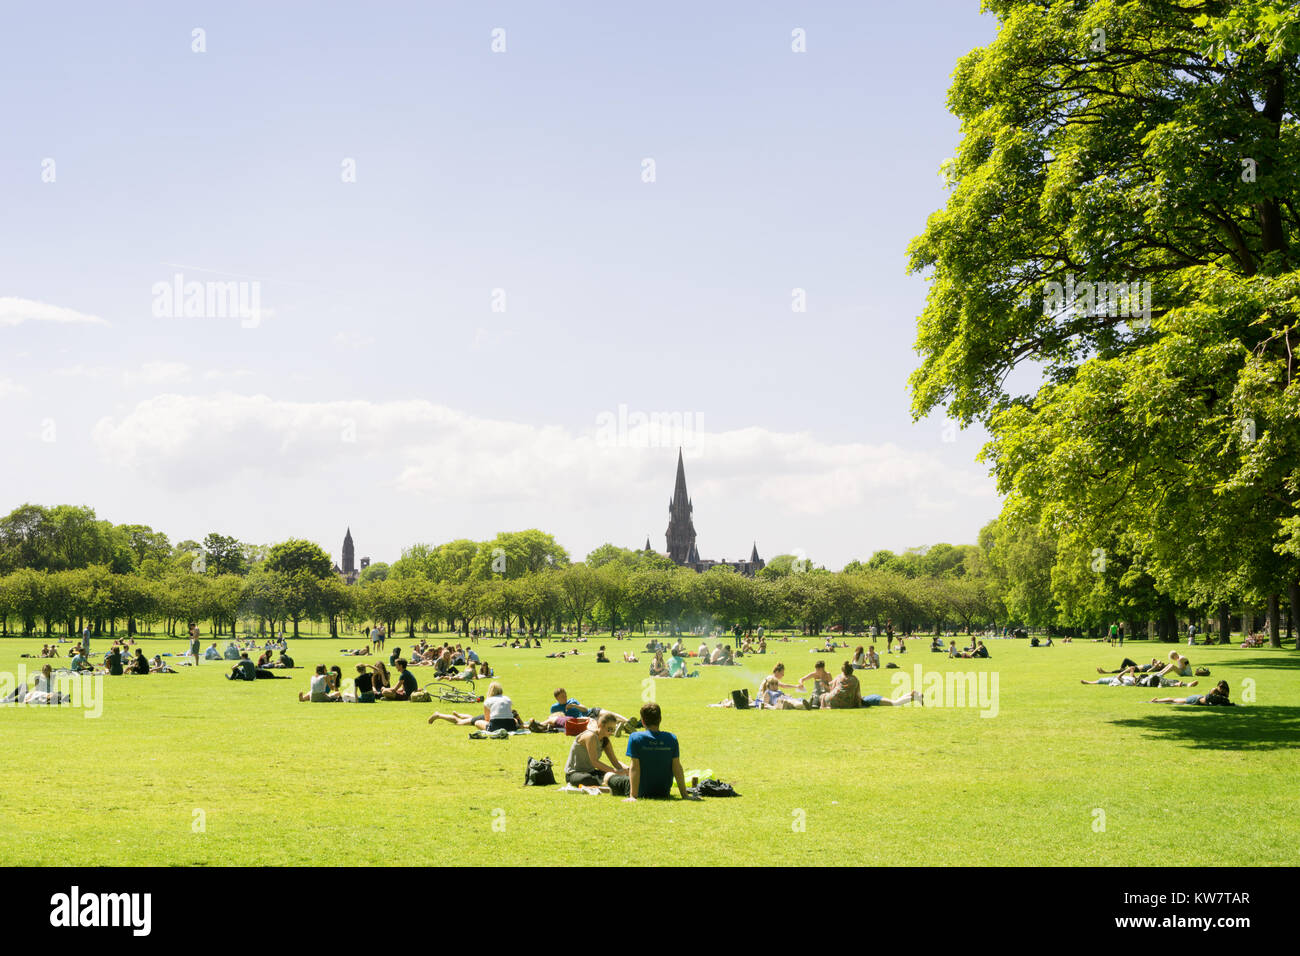 Young people, students of Edinburgh University enjoy a sunny day in the Meadows, Edinburgh, Scotland, UK, sunbathing - Stock Image